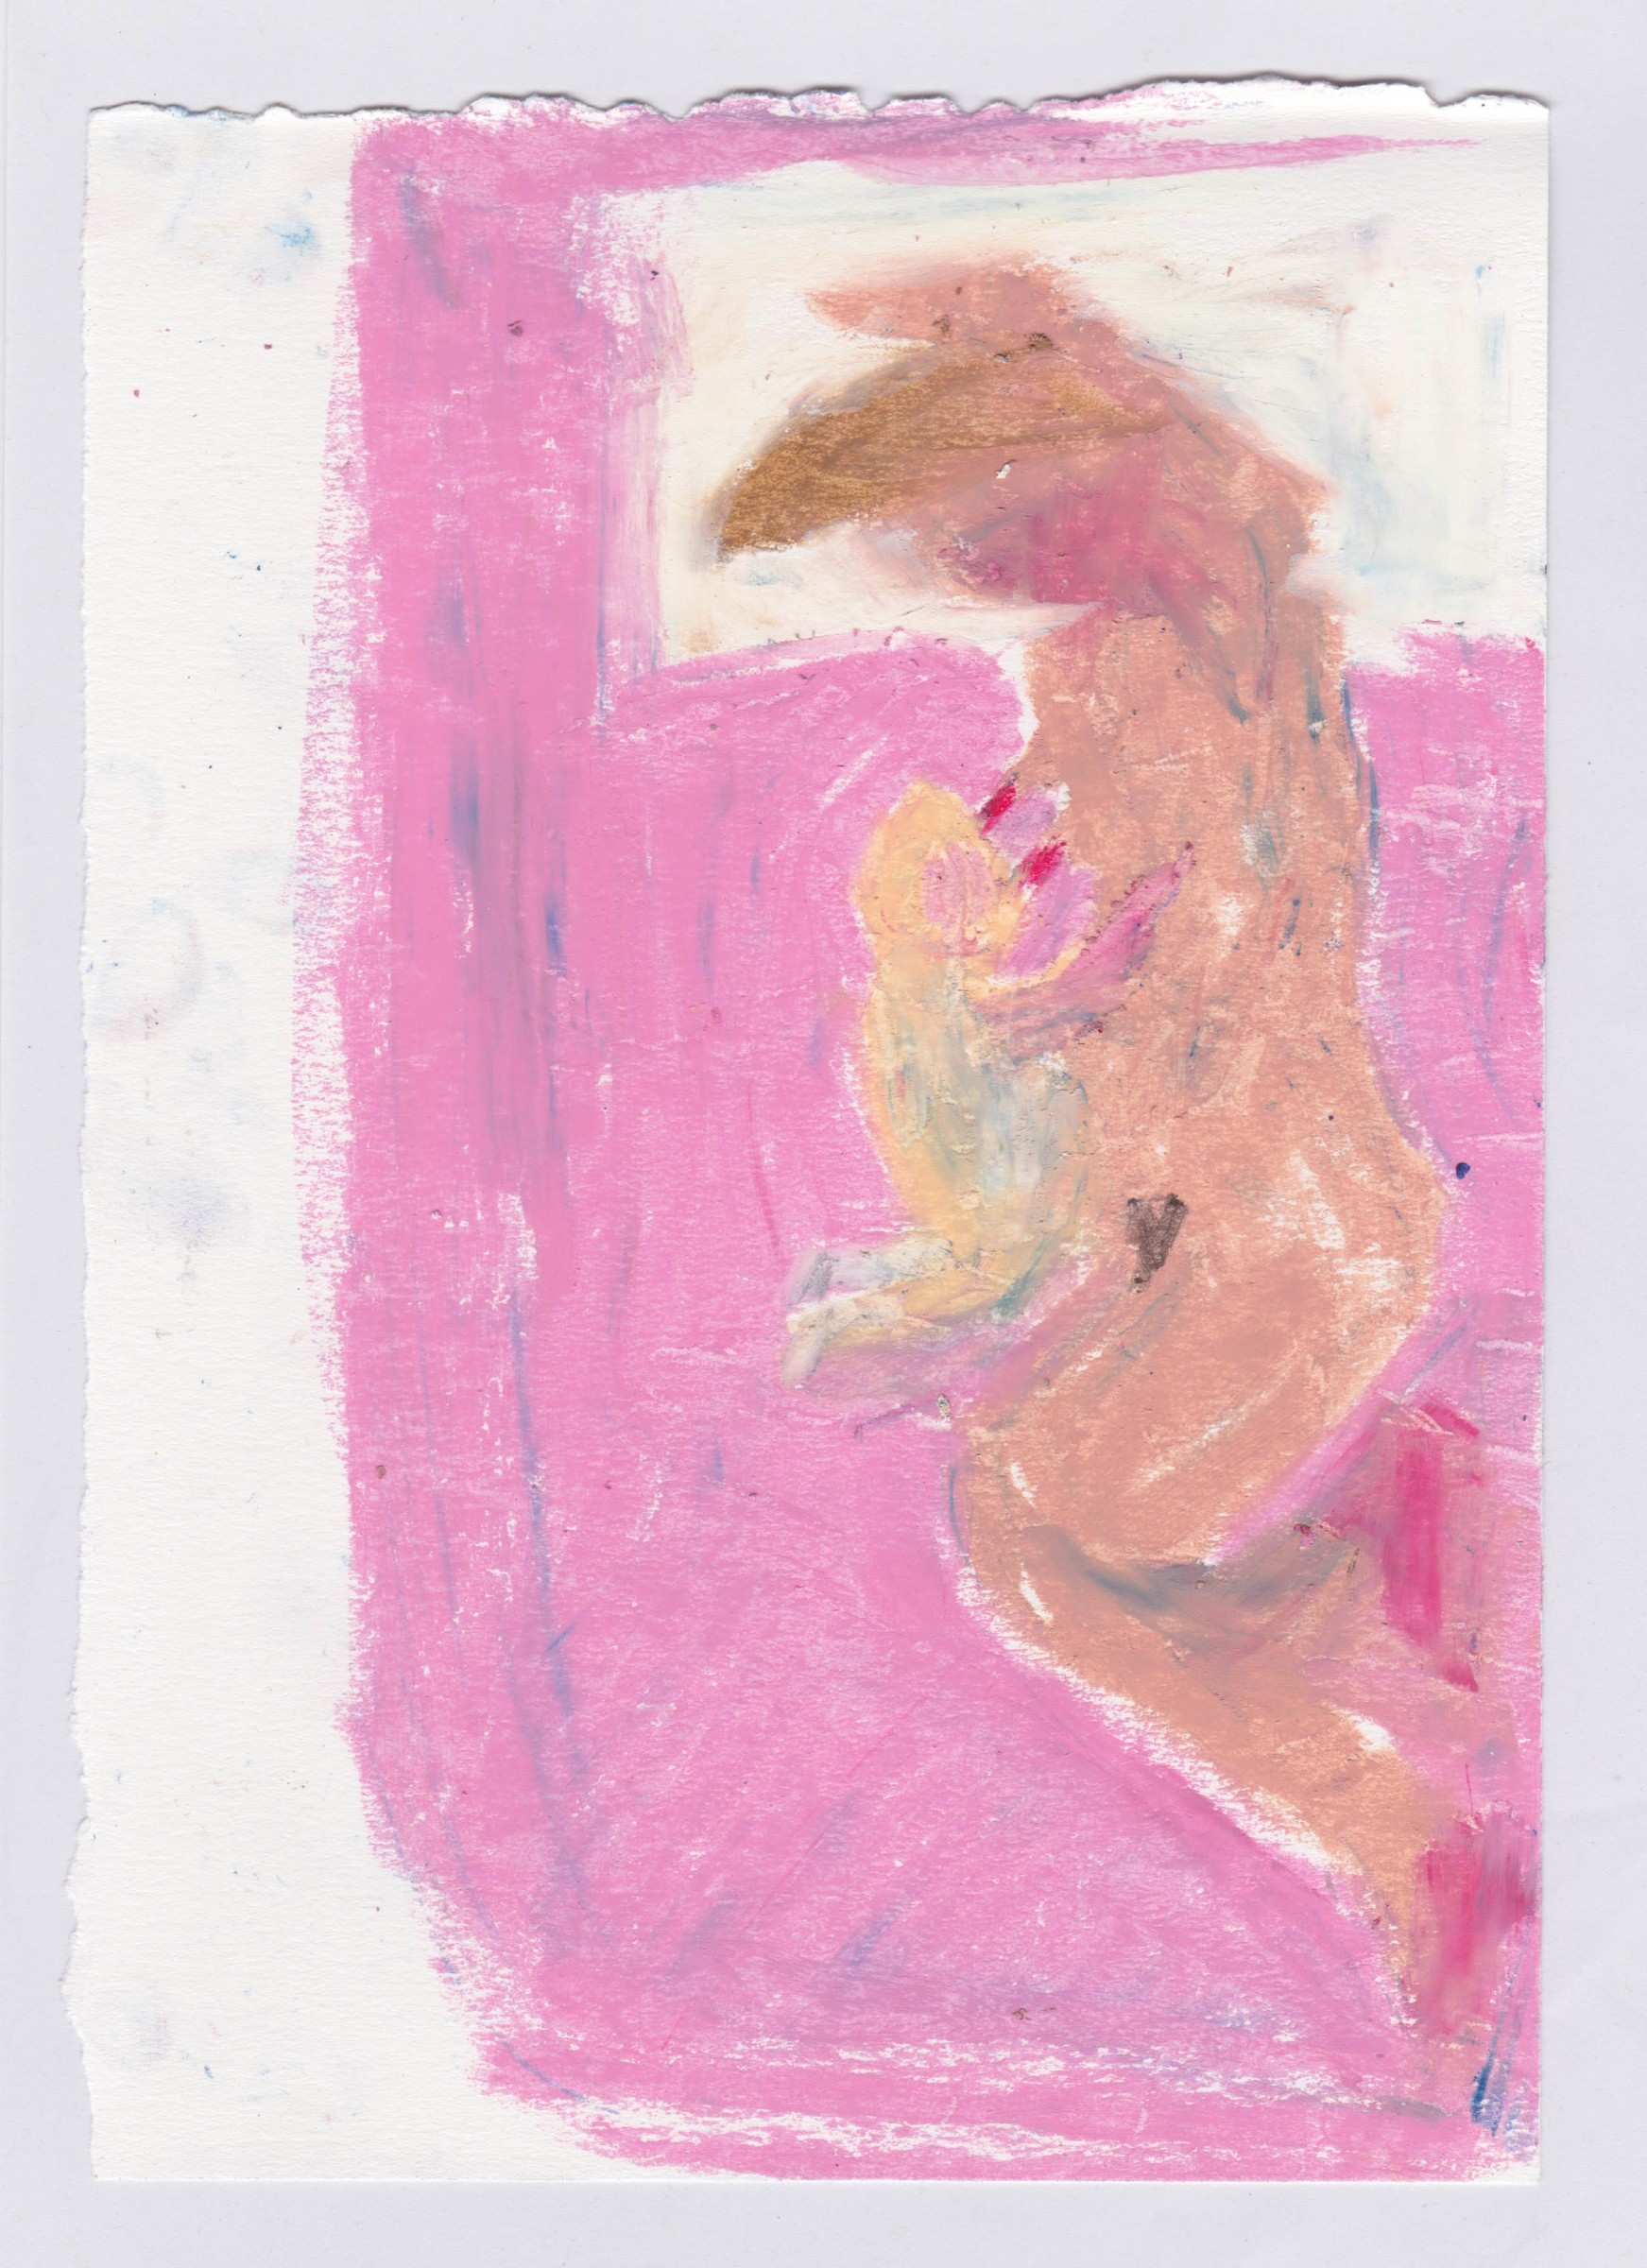 "<span class=""link fancybox-details-link""><a href=""/exhibitions/39/works/artworks_standalone12364/"">View Detail Page</a></span><div class=""medium"">oil pastel on paper</div><div class=""dimensions"">Artwork: 25.5 x 18cm</div>"